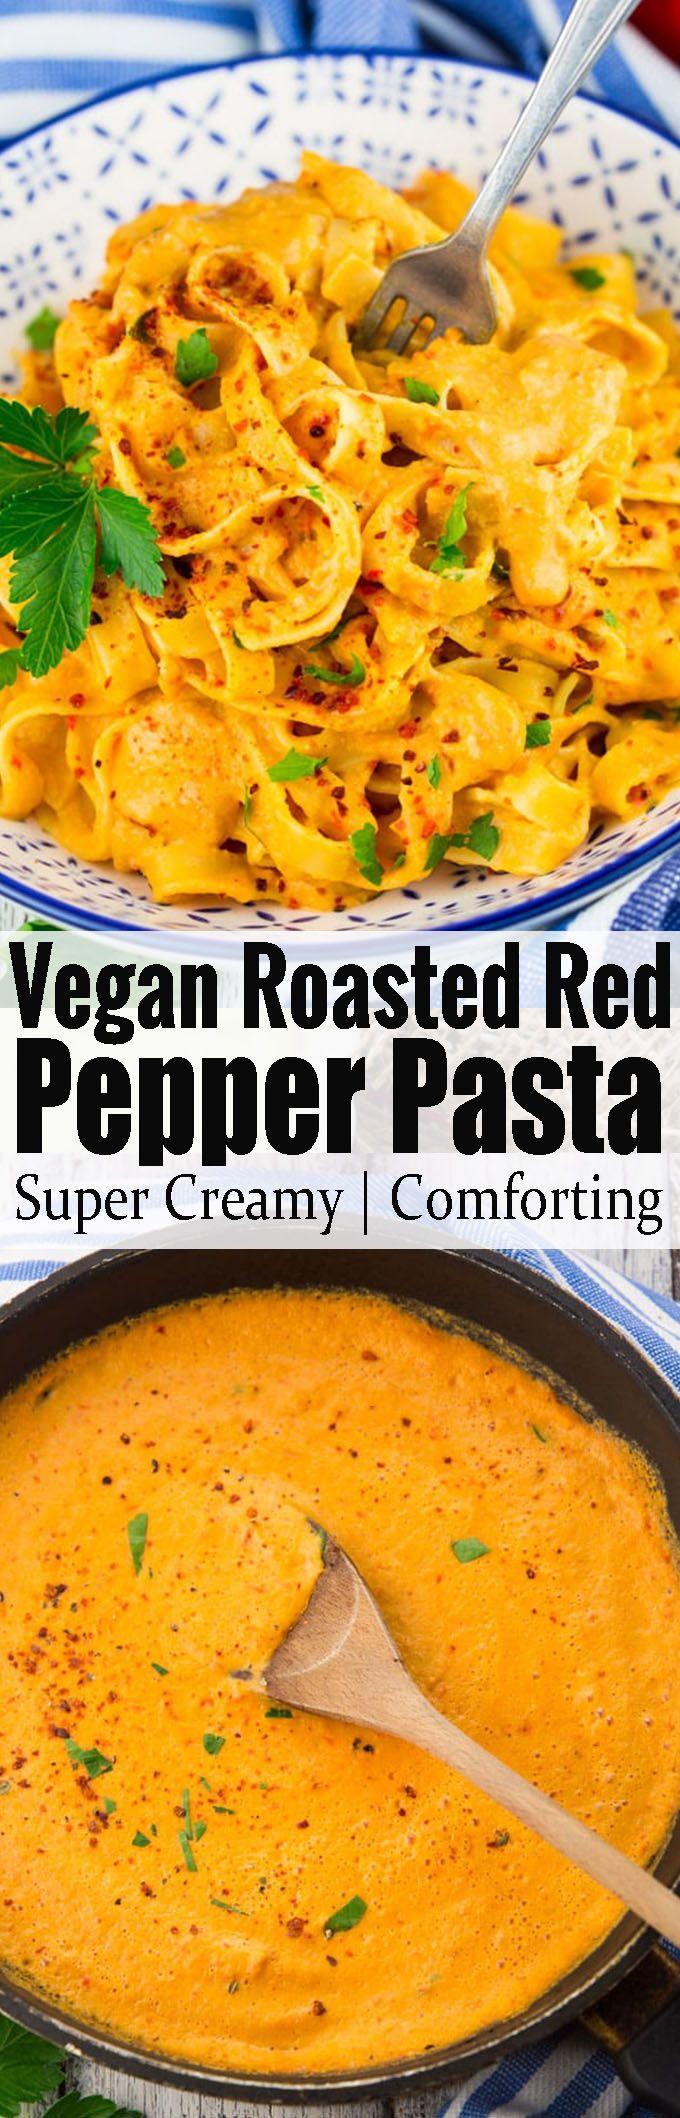 This vegan roasted red pepper pasta makes such a delicious vegan dinner! It's the ultimate vegan comfort food! Find more vegan recipes at veganheaven.org!